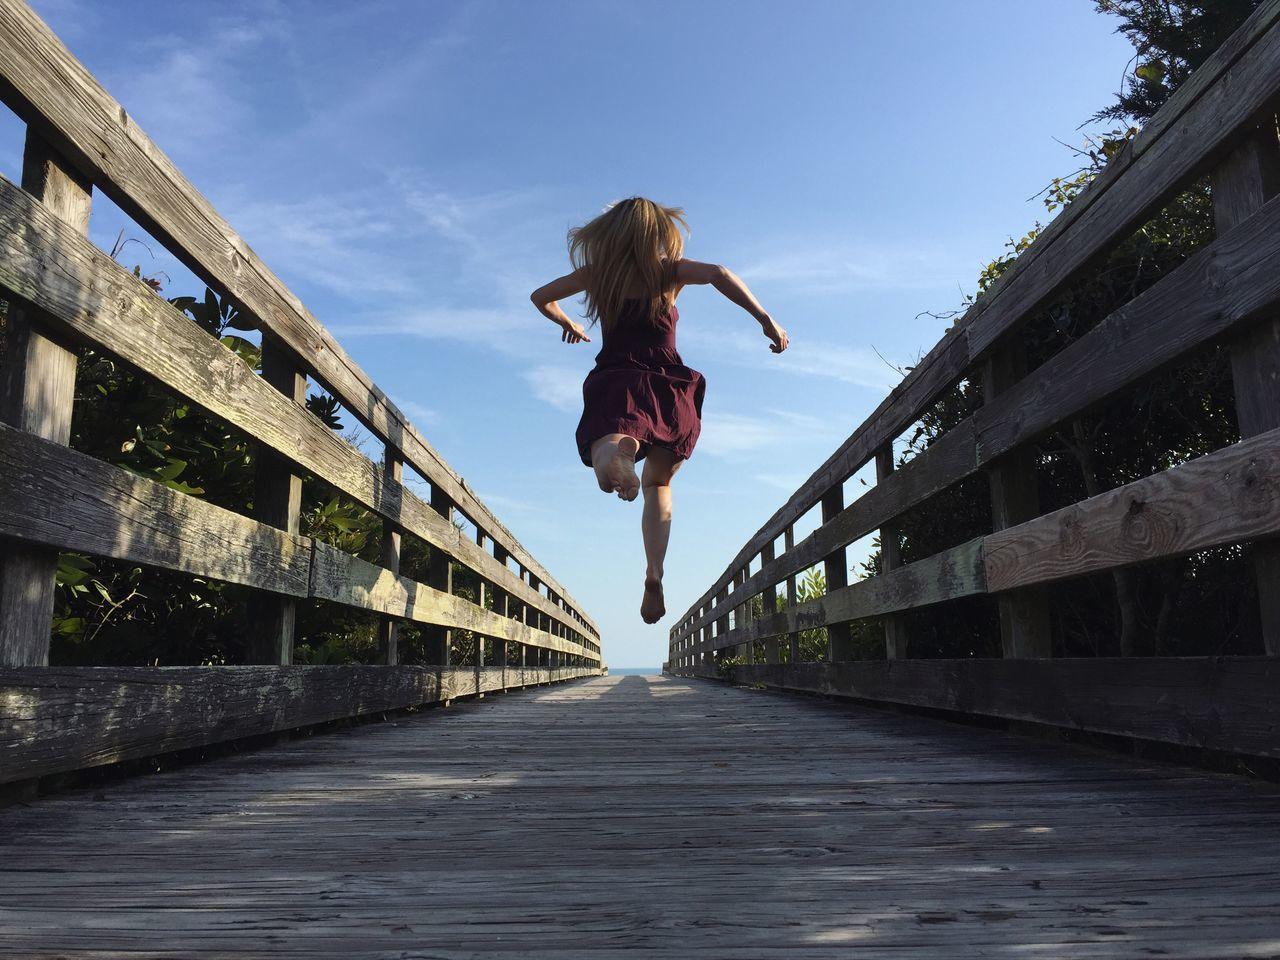 Rear view of woman jumping on footbridge against sky